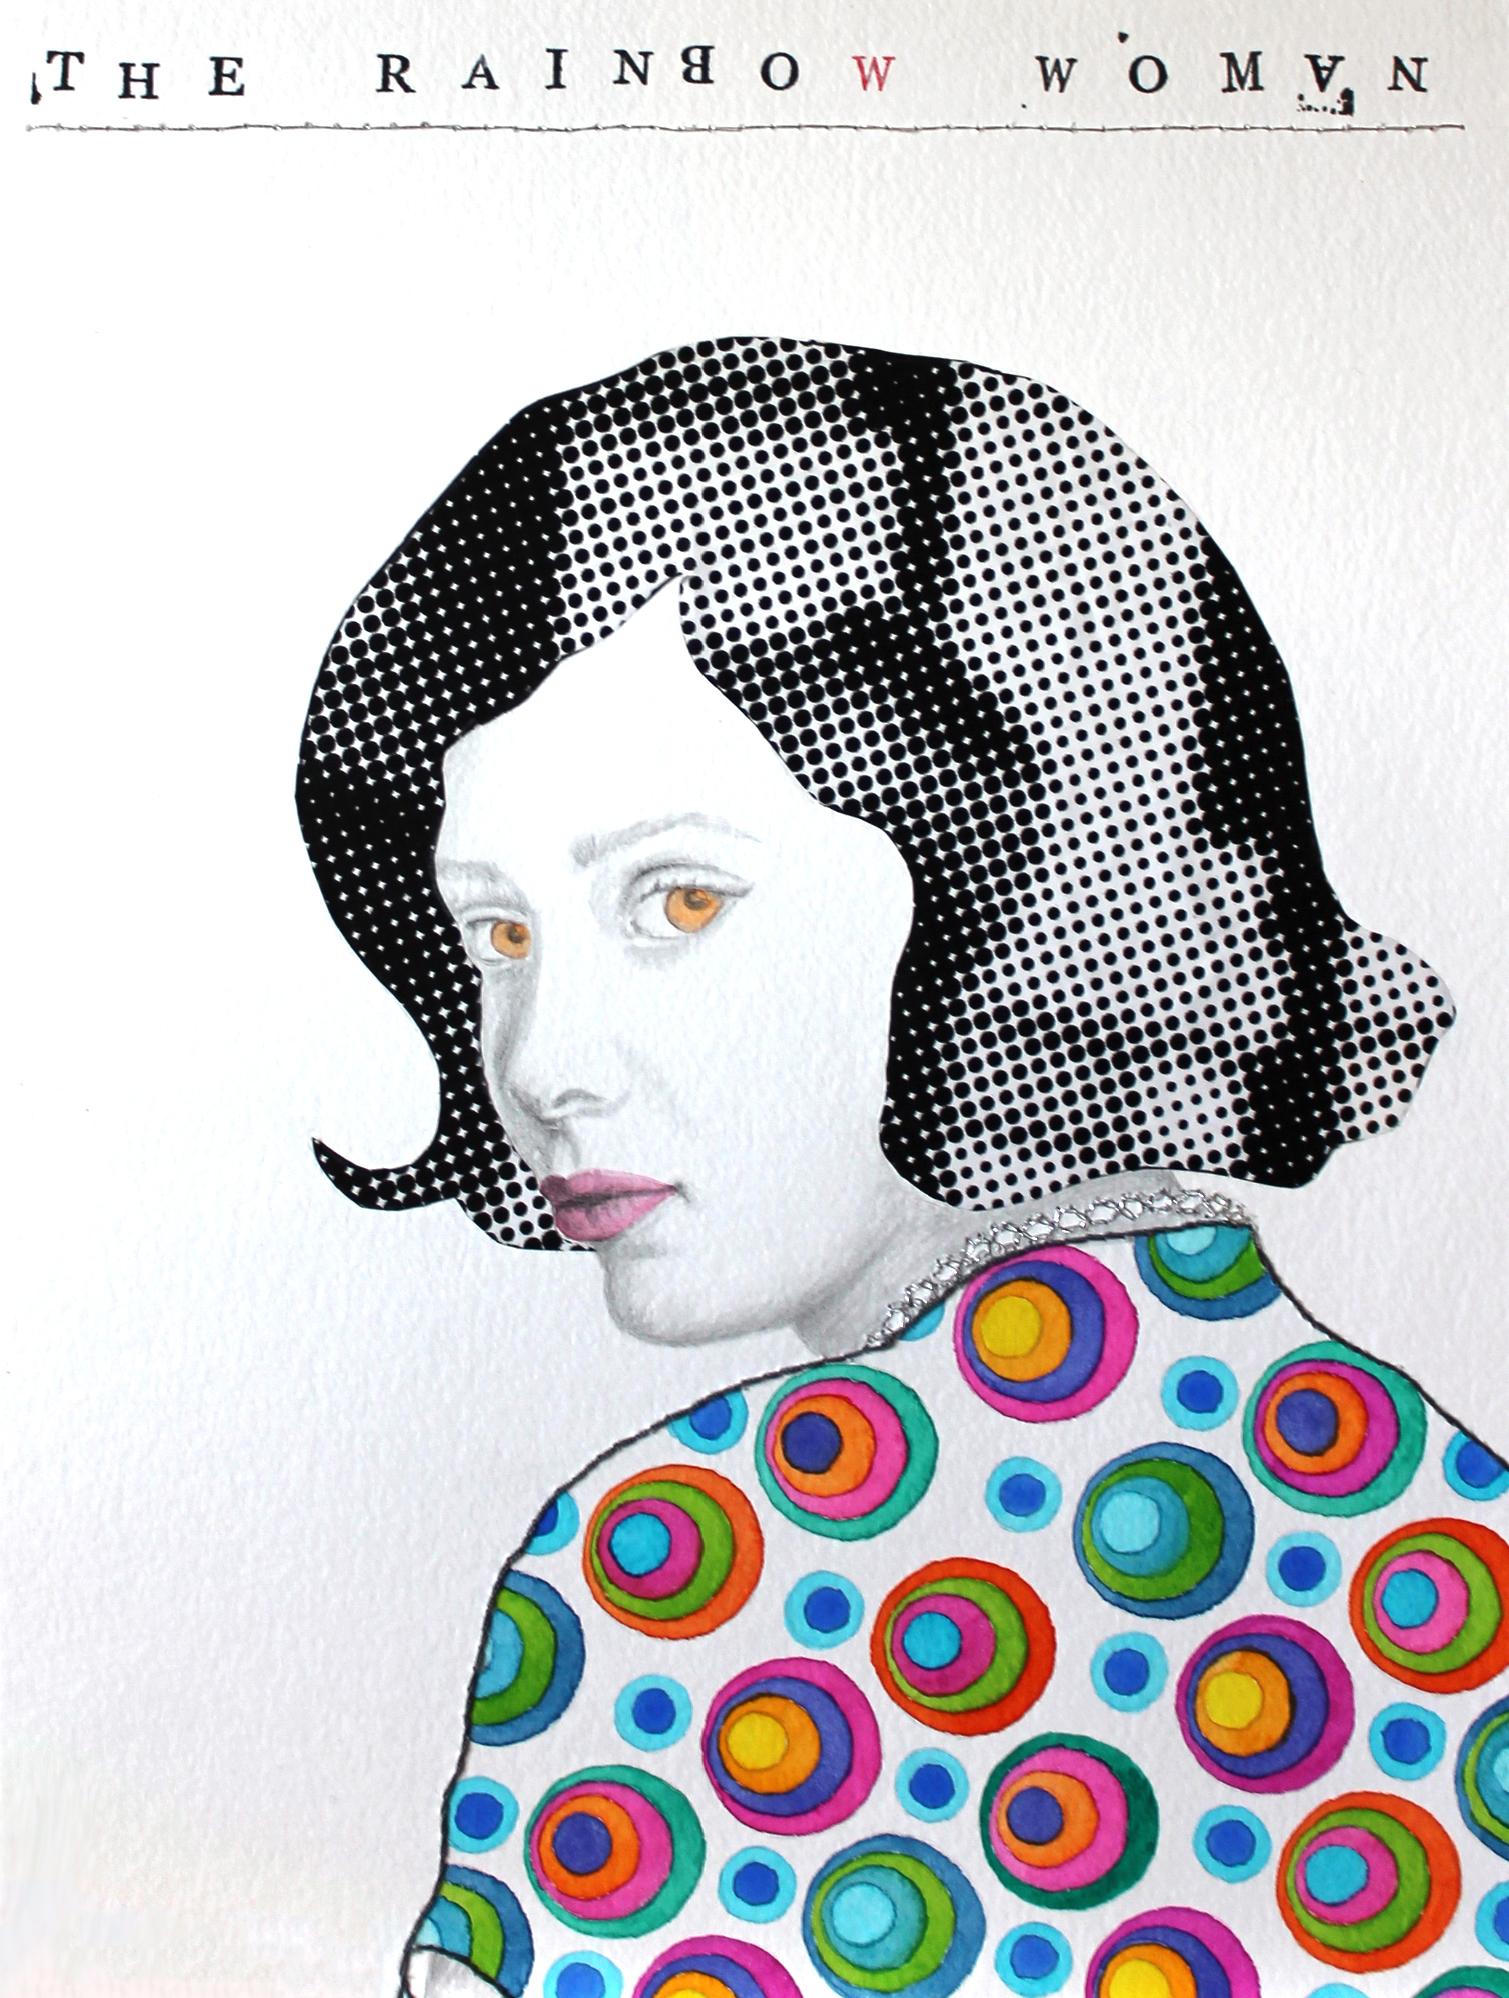 Rainbow woman 2